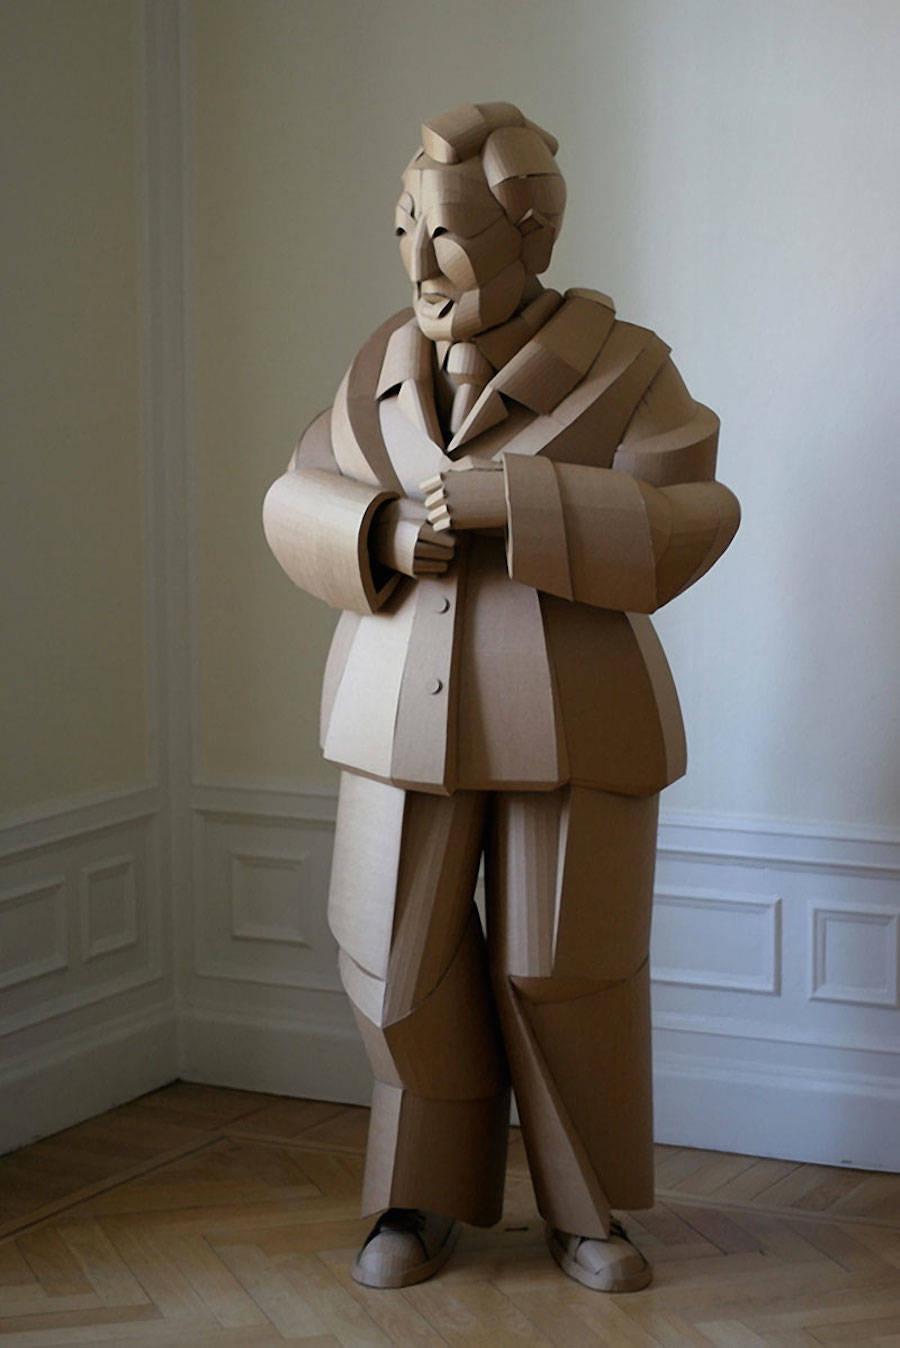 LifeSize Cardboard Figures by Warren King  Design